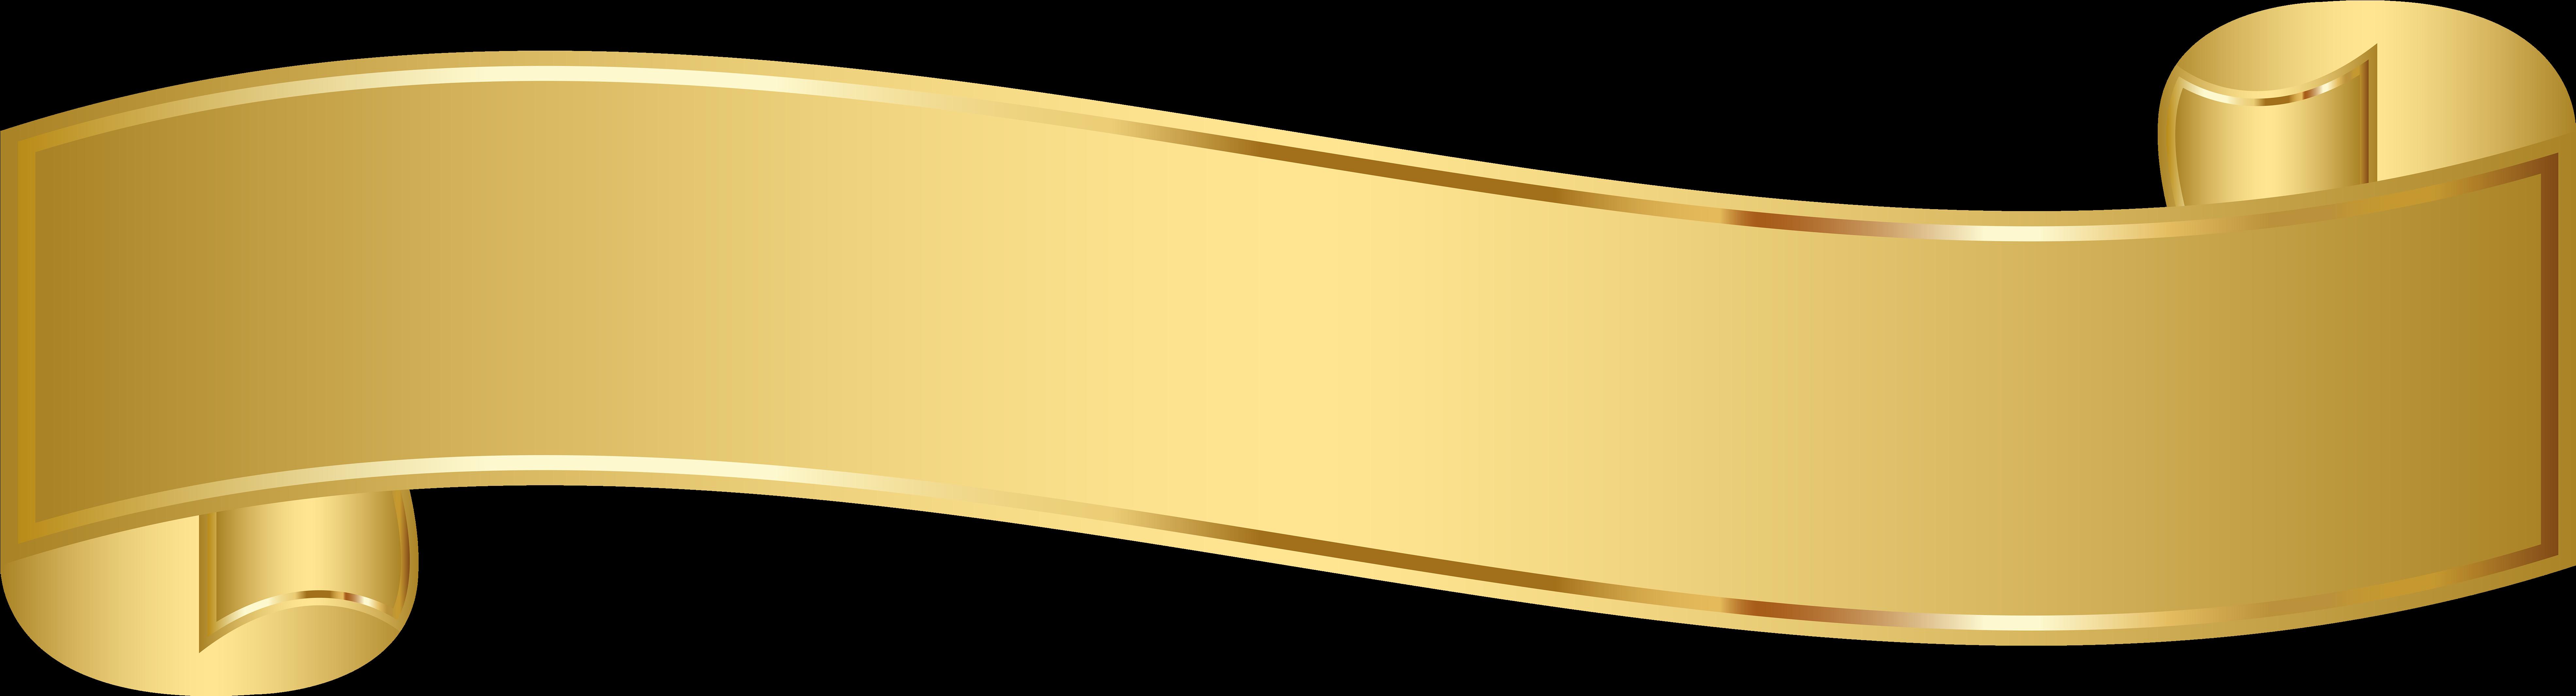 Года, лента для надписи картинка